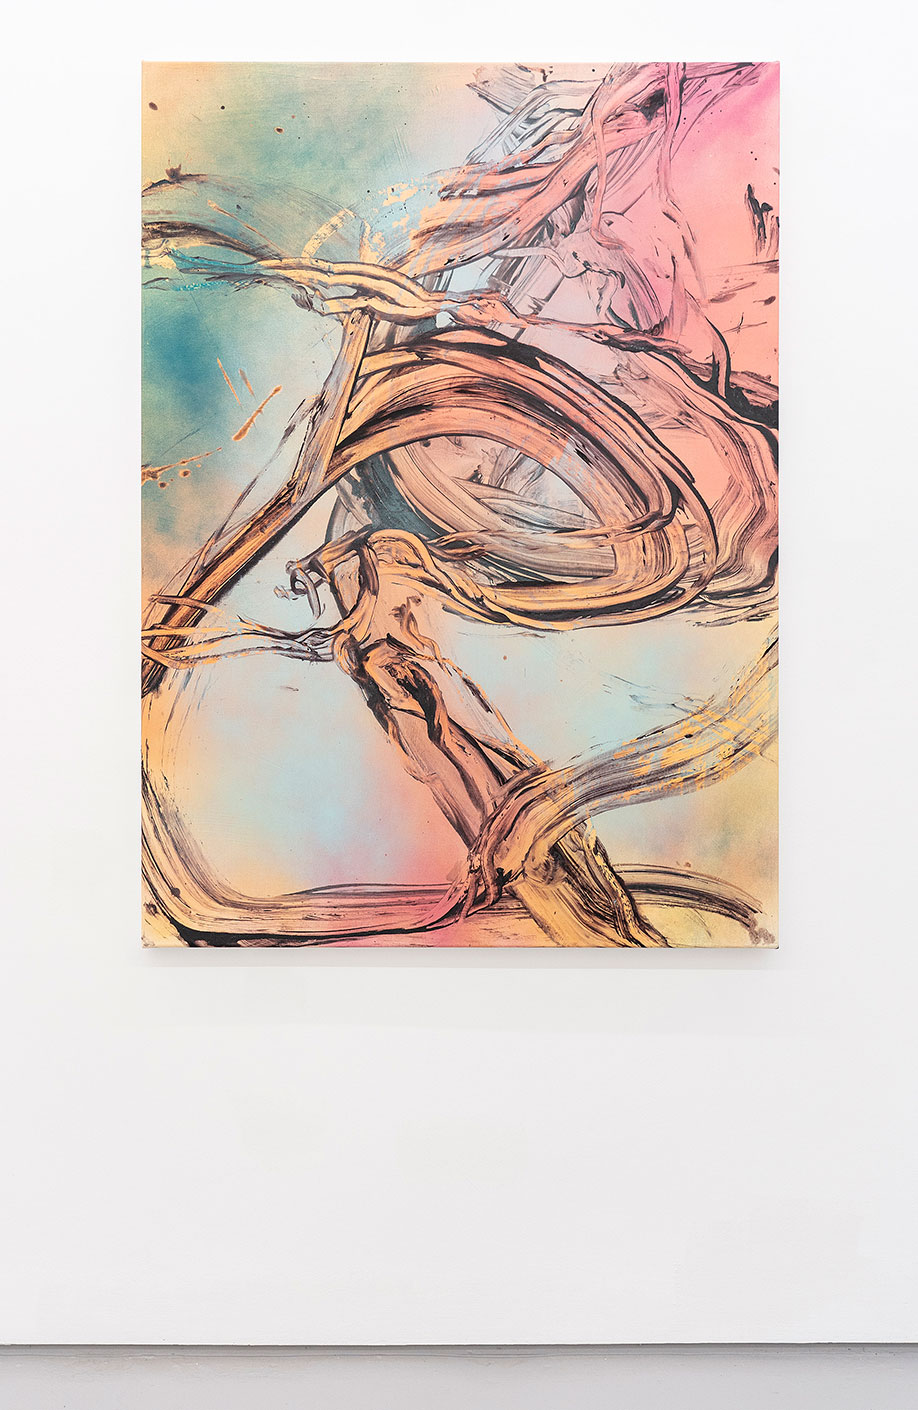 <b>Title:</b>Cloud Rider<br /><b>Year:</b>2018<br /><b>Medium:</b>Acrylic and oil on canvas<br /><b>Size:</b>140 x 100 cm